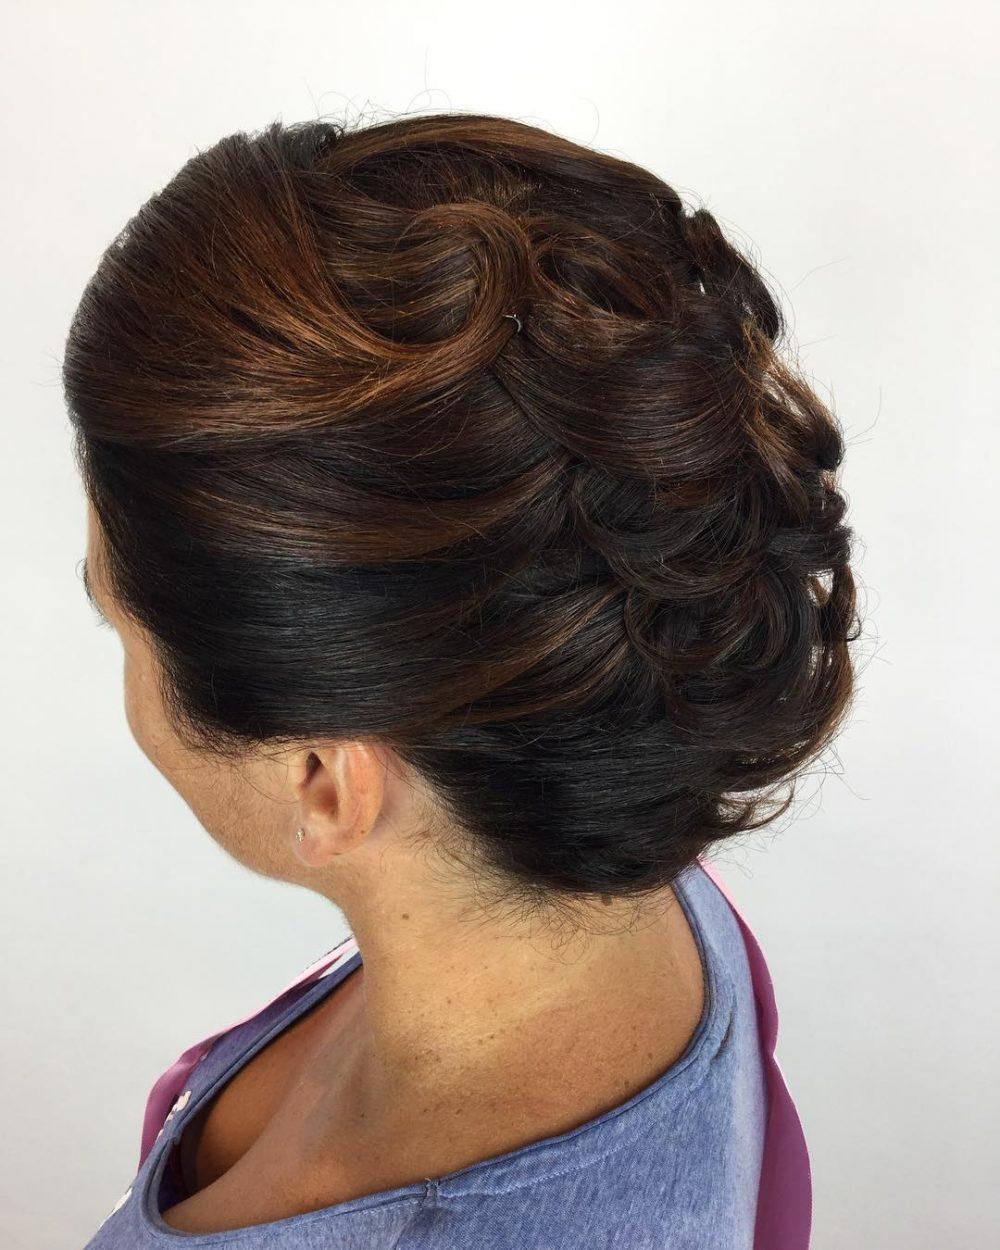 Modernized French Twist hairstyle